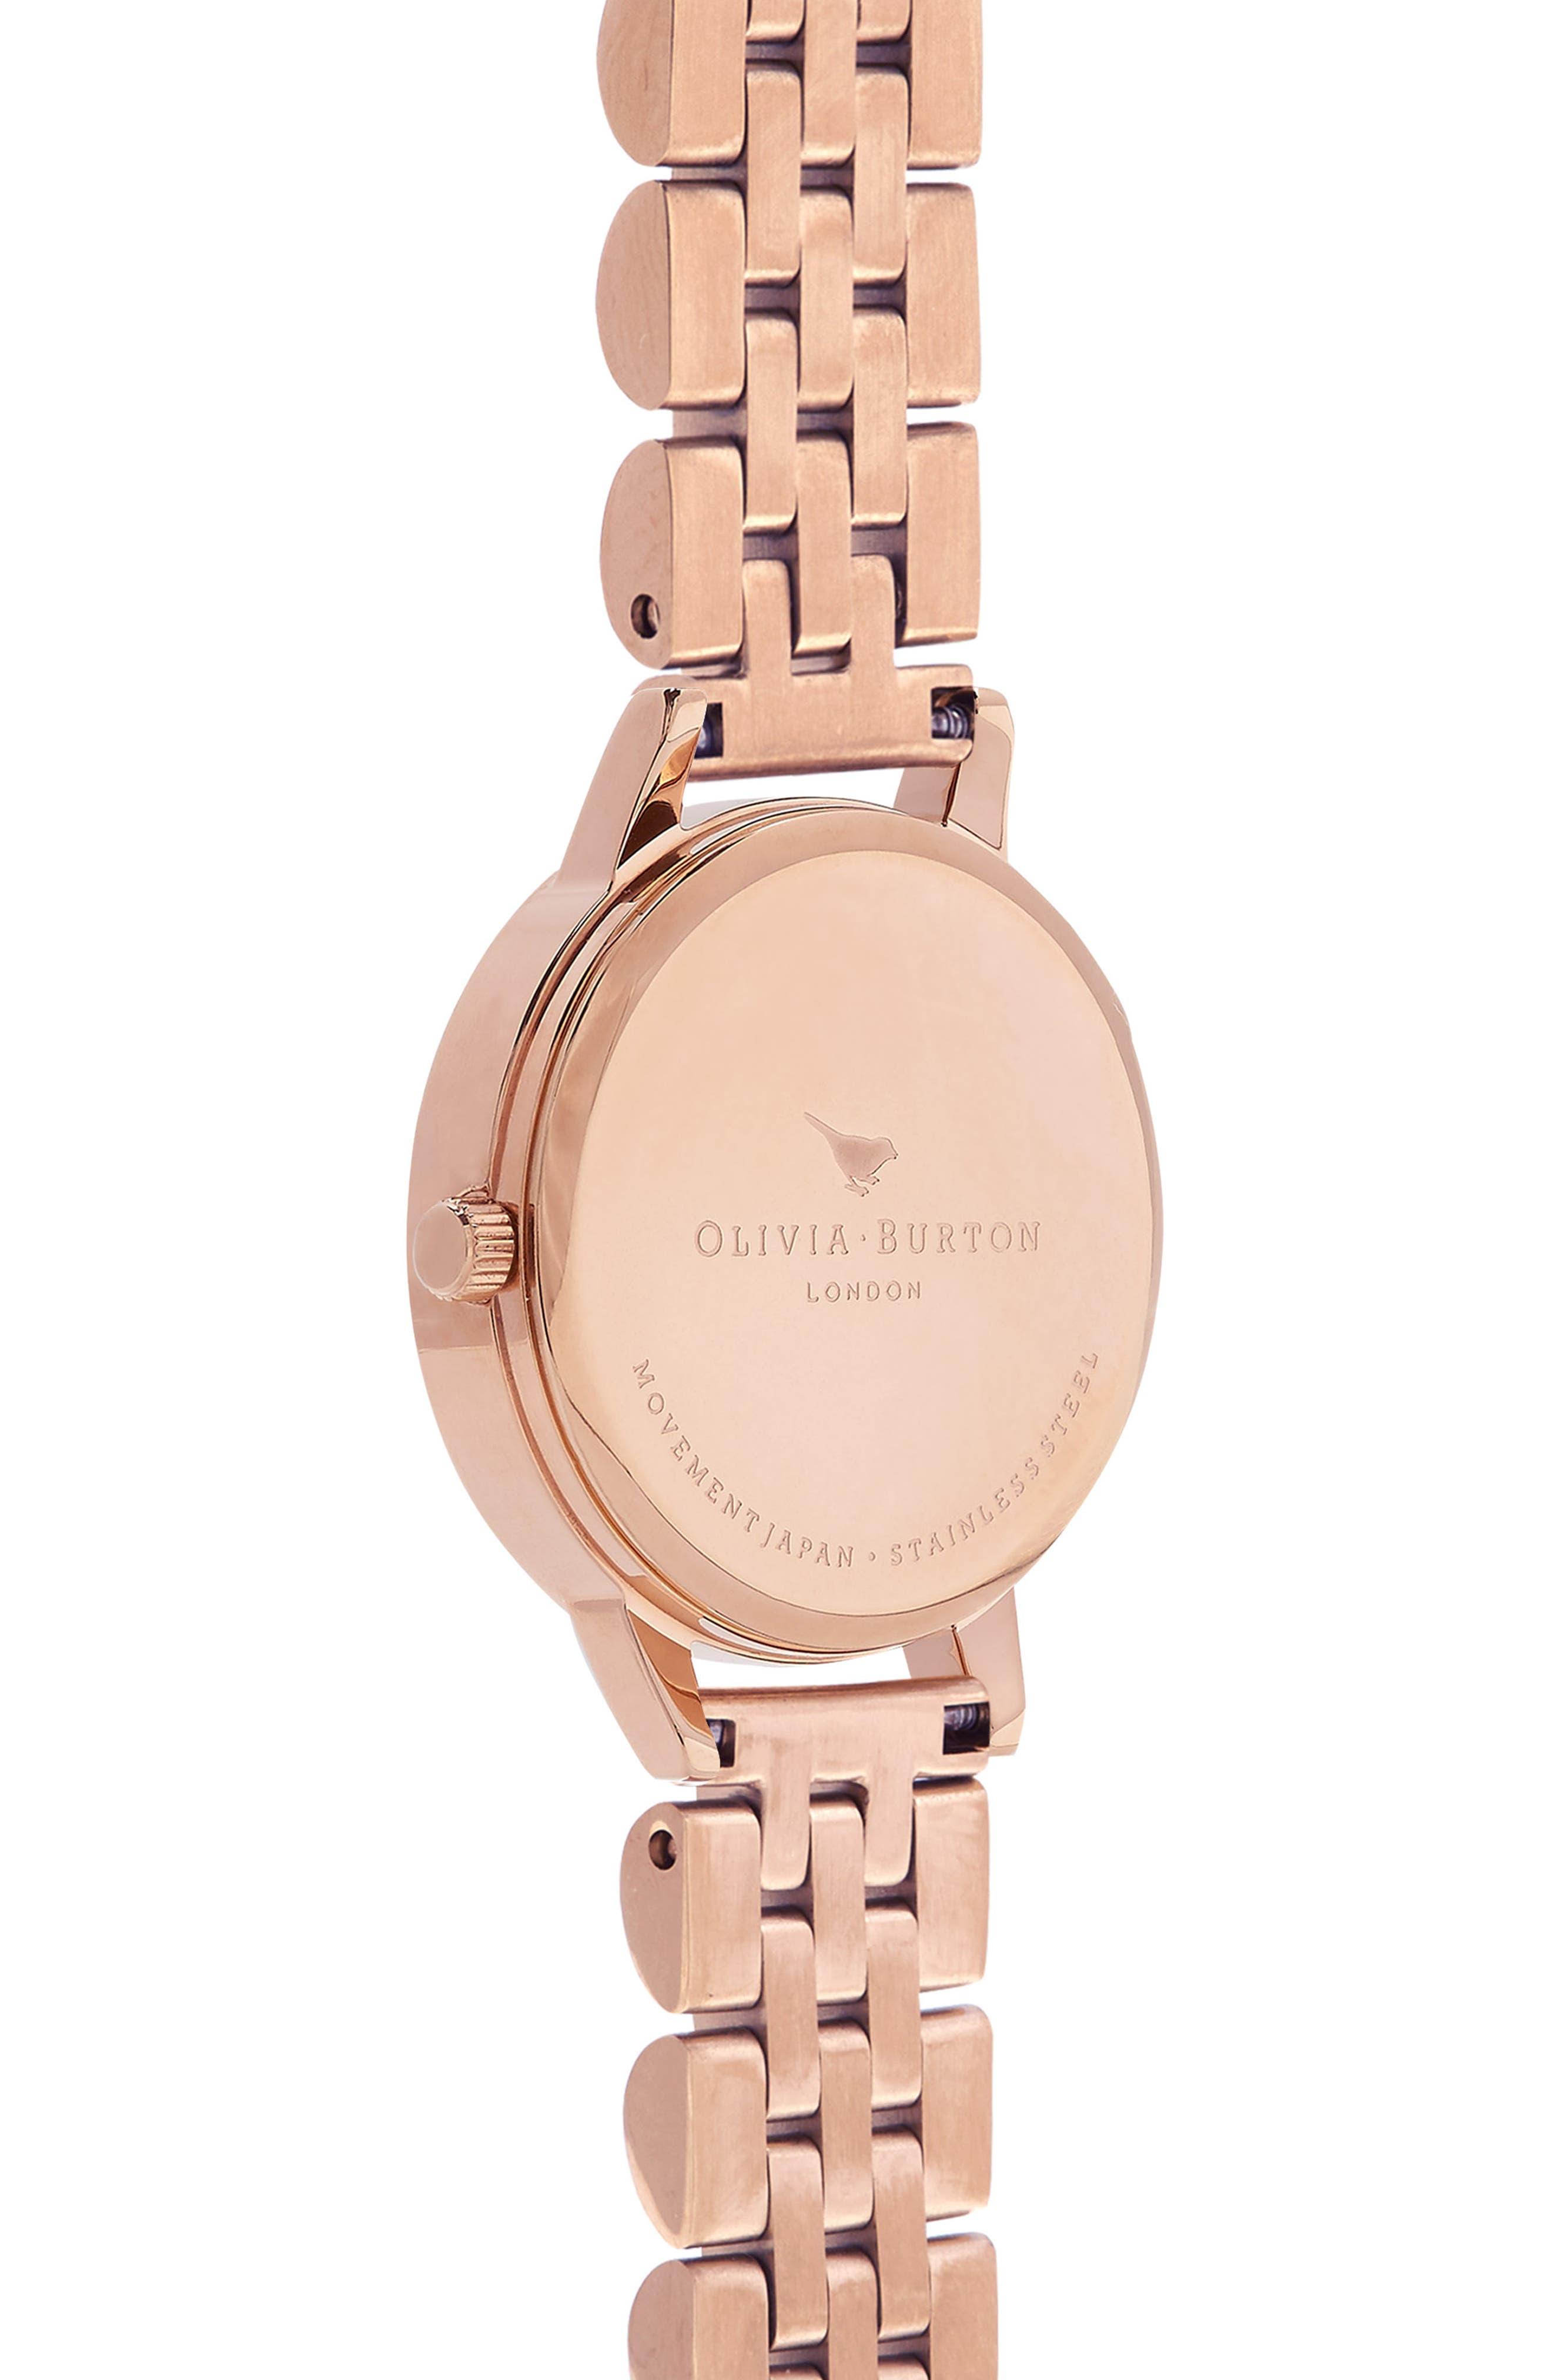 OLIVIA BURTON,                             Wonderland Bracelet Watch, 30mm,                             Alternate thumbnail 3, color,                             ROSE GOLD/ HITE/ ROSE GOLD